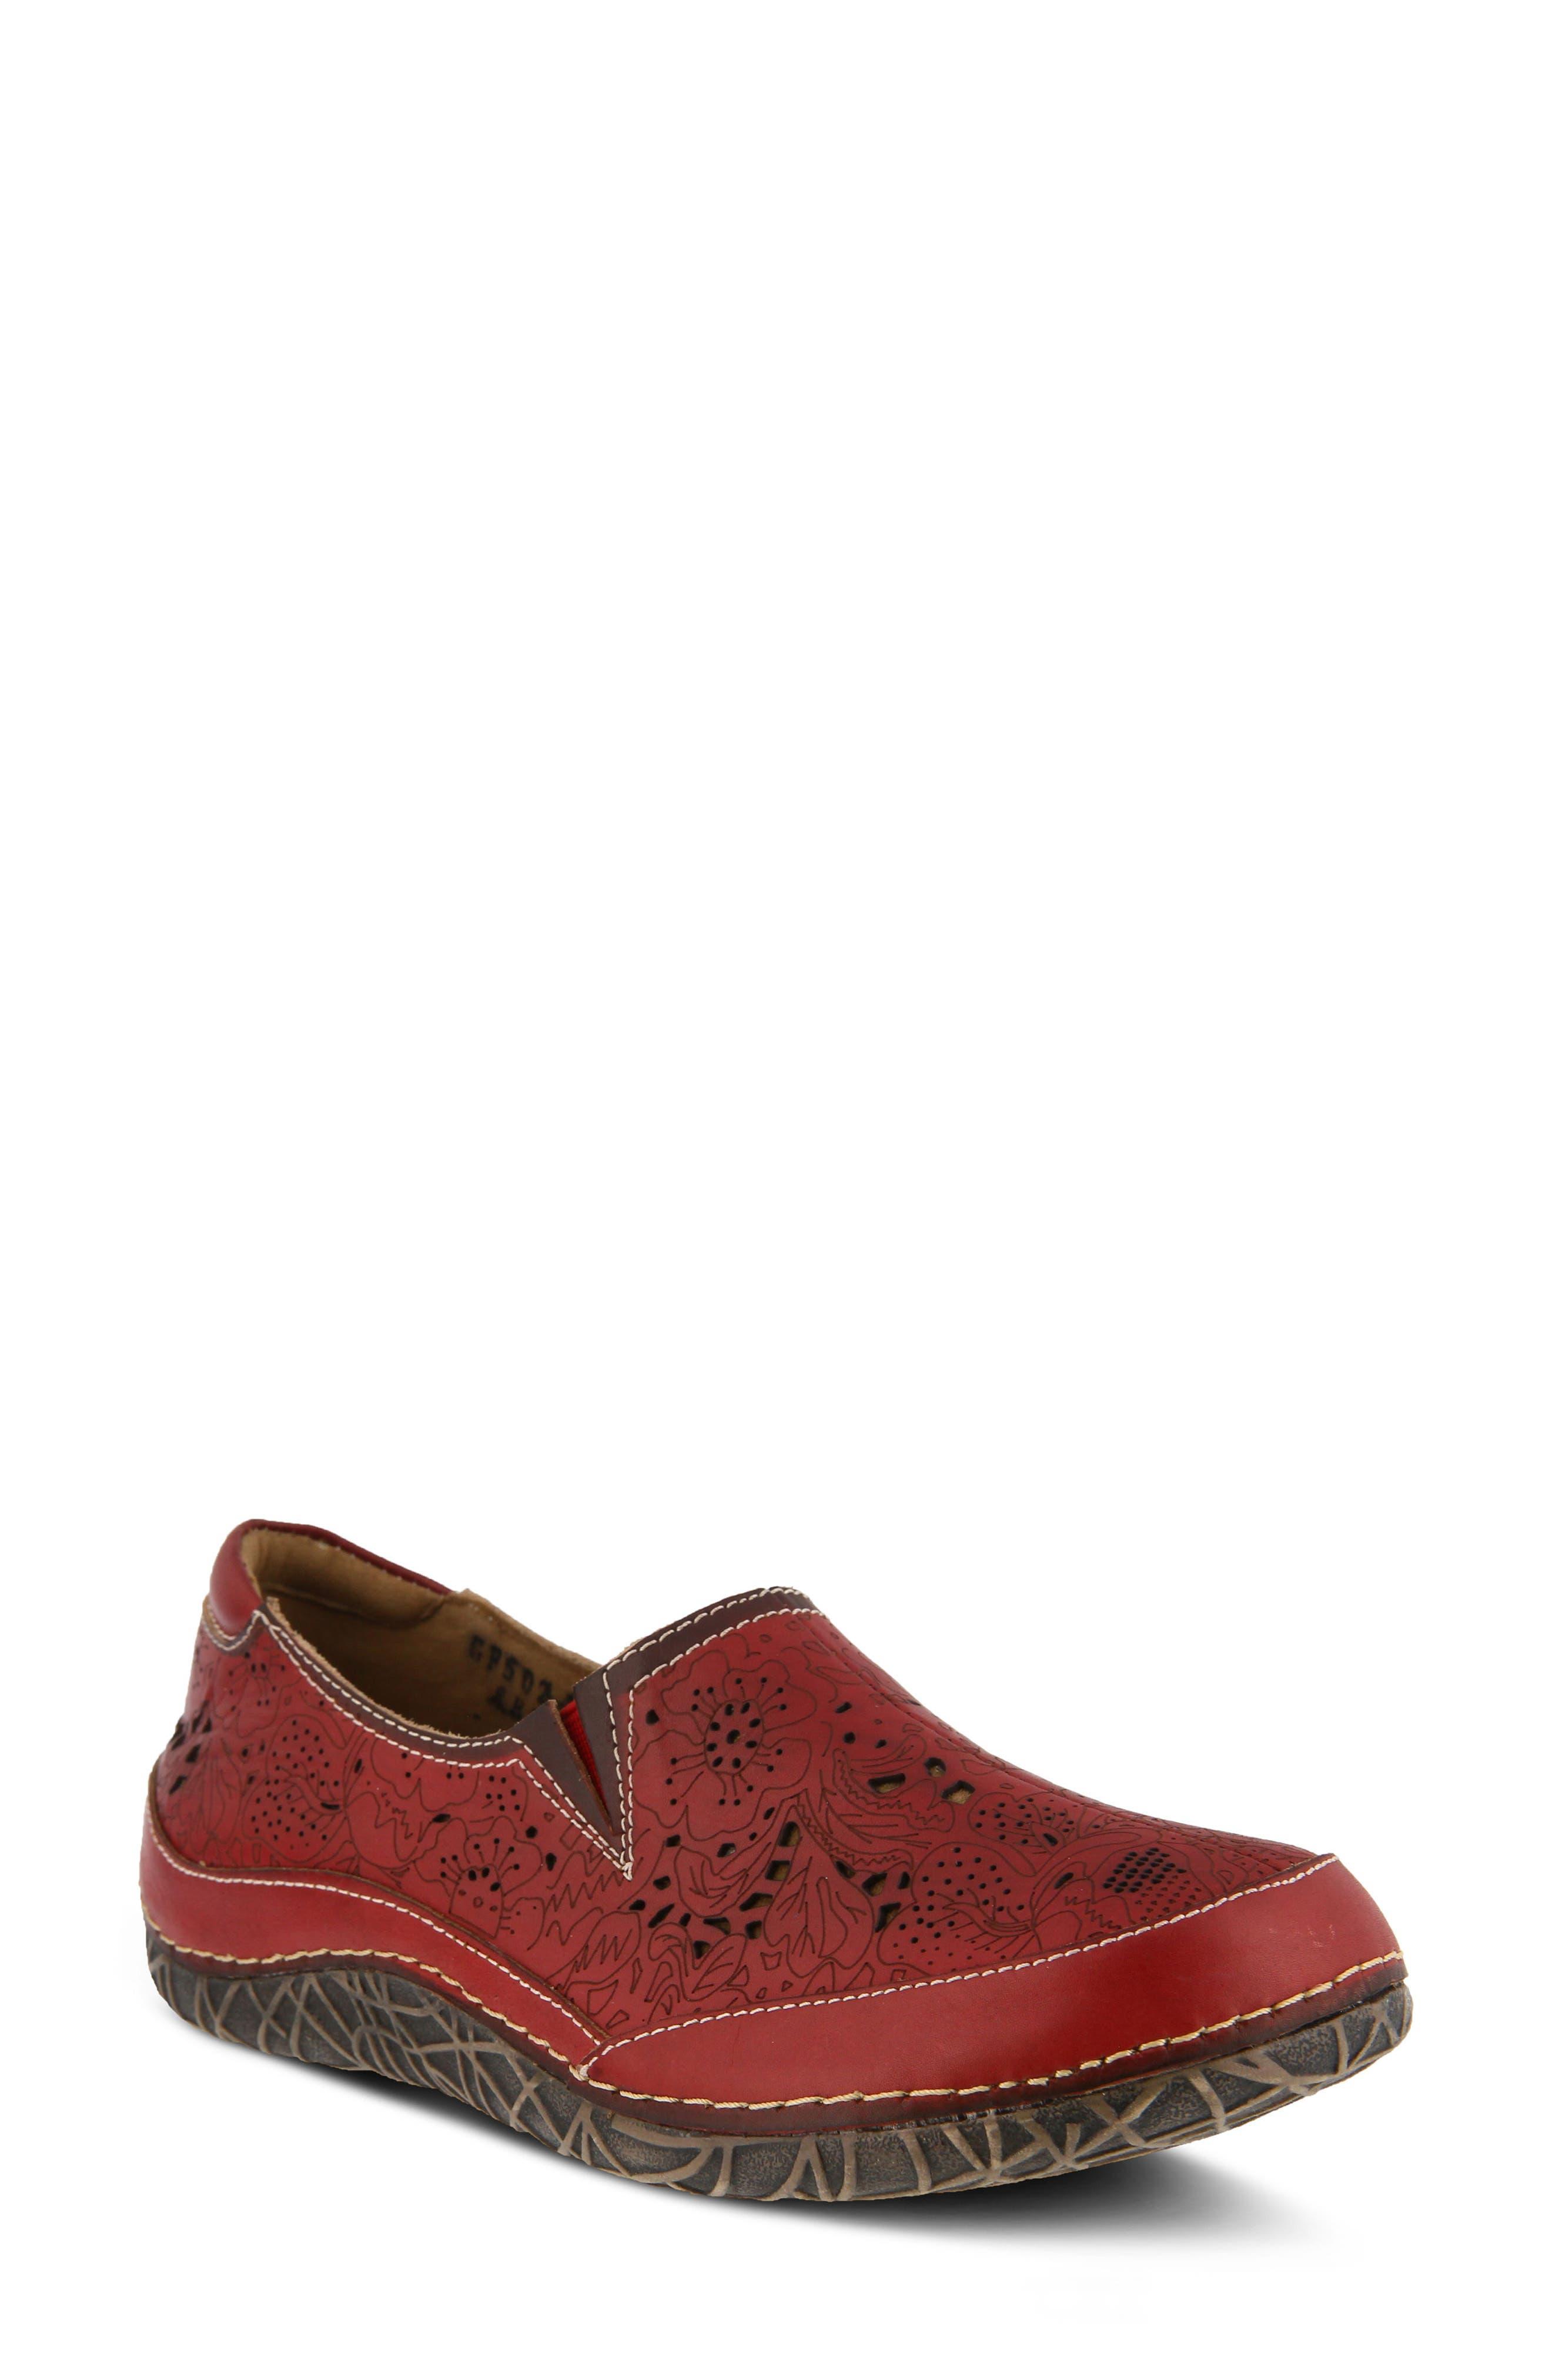 L'Artiste Libora Slip-On Flat,                         Main,                         color, Red Leather